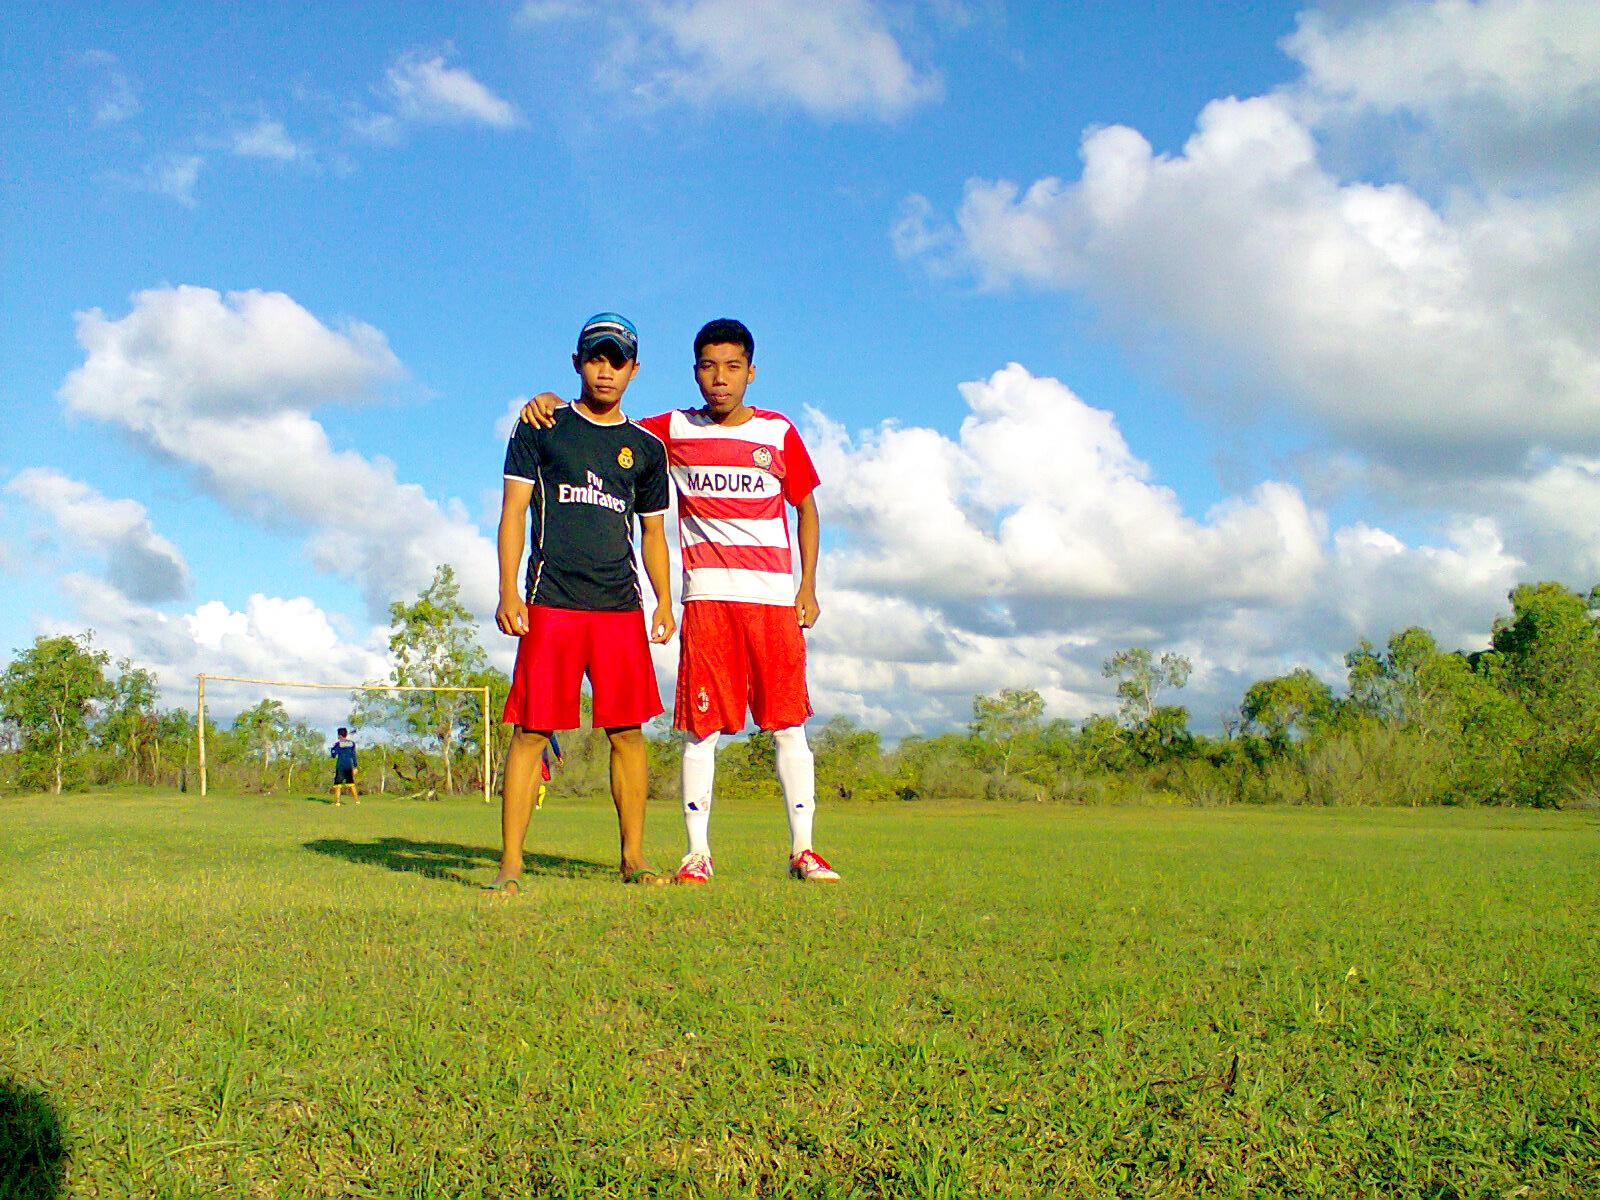 Tengket Beach Maneron 10 Lapangan Sepak Bola Pantai Setiap Tahunnya